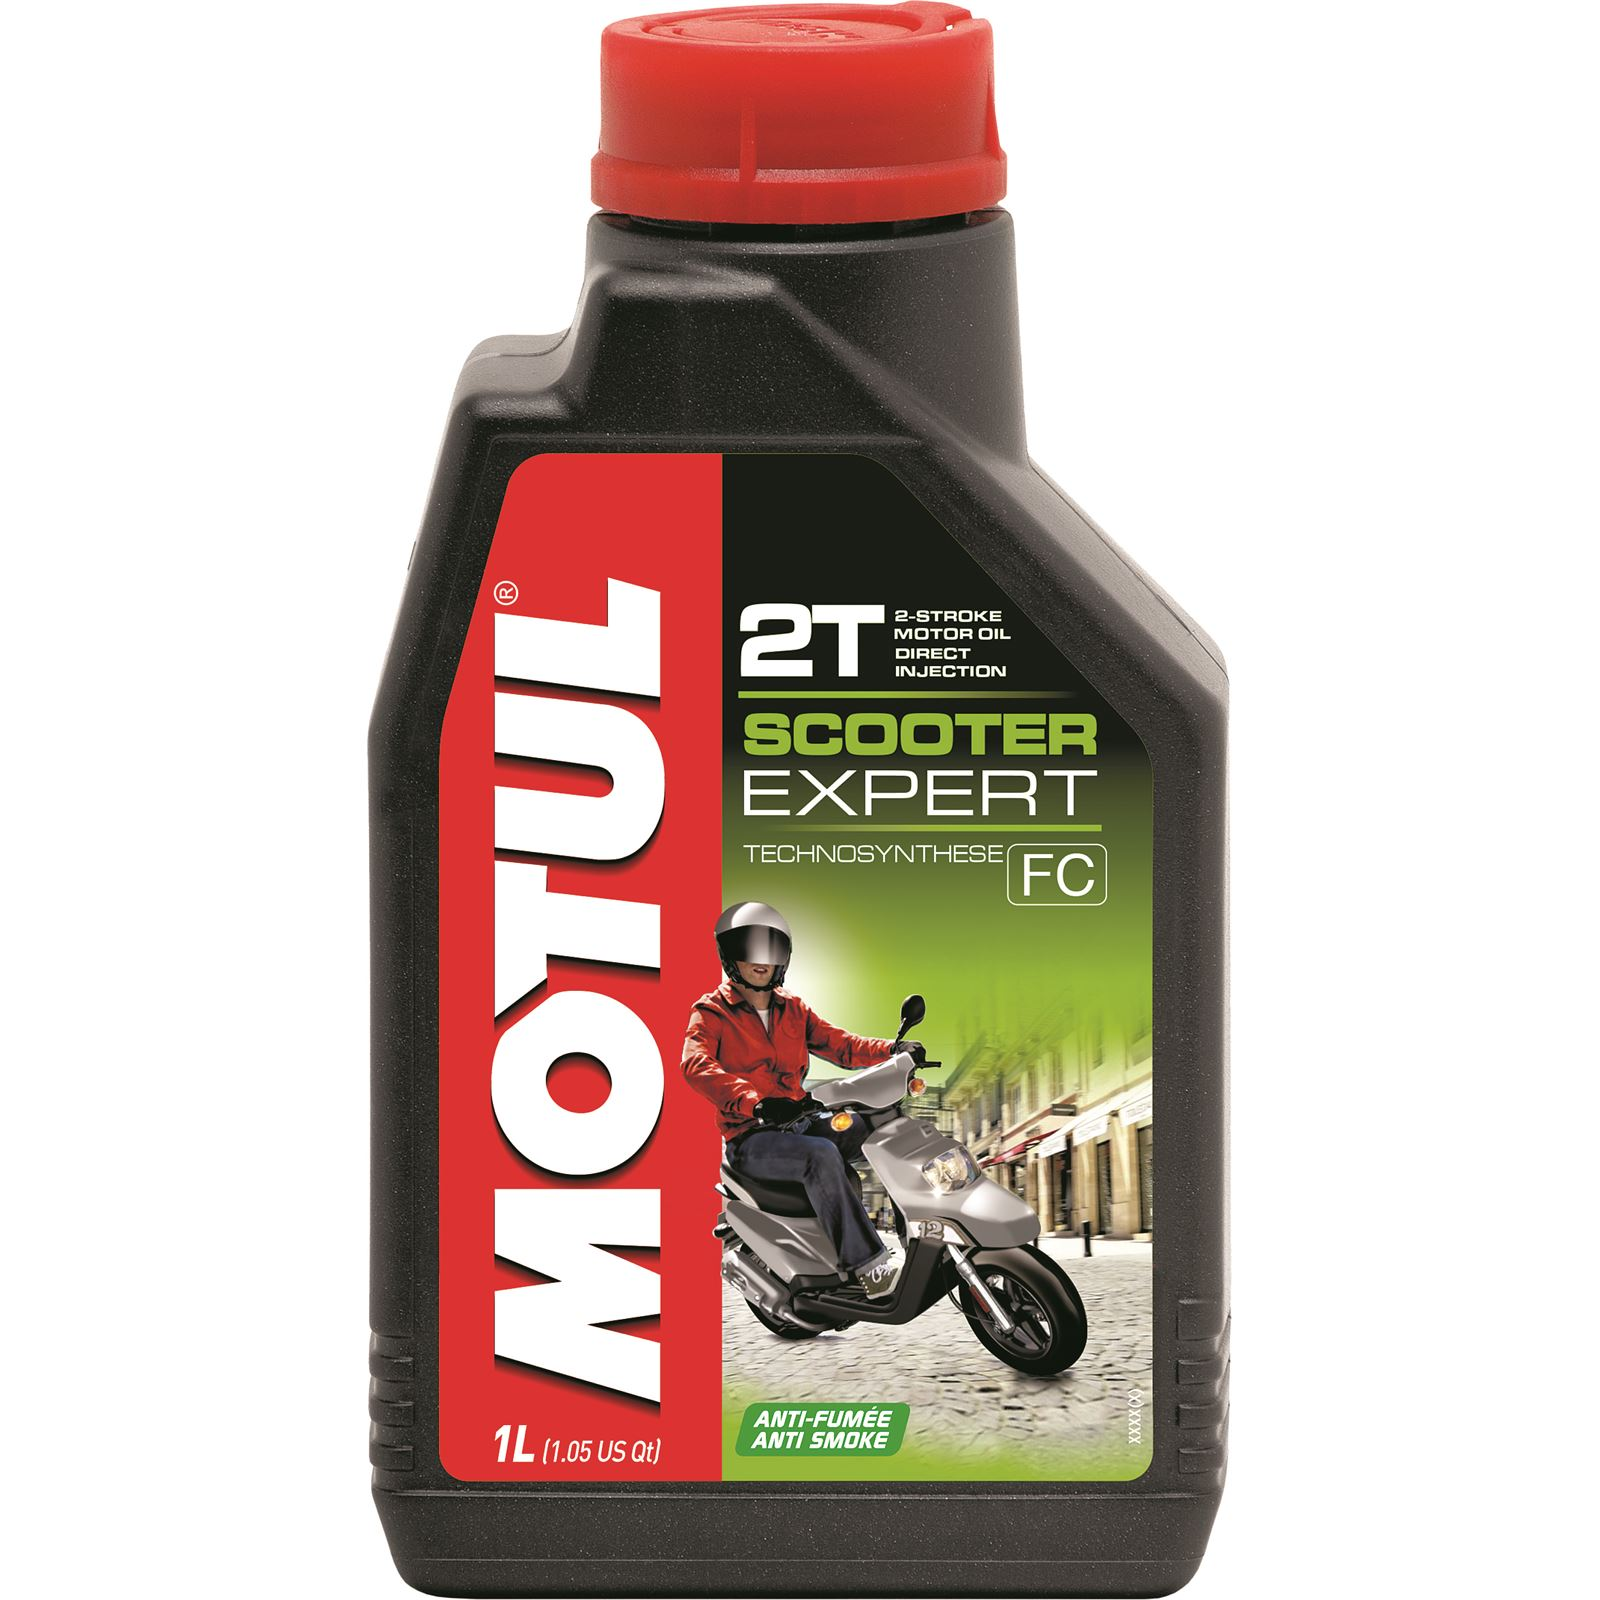 Motul Scooter Expert 2T Oil